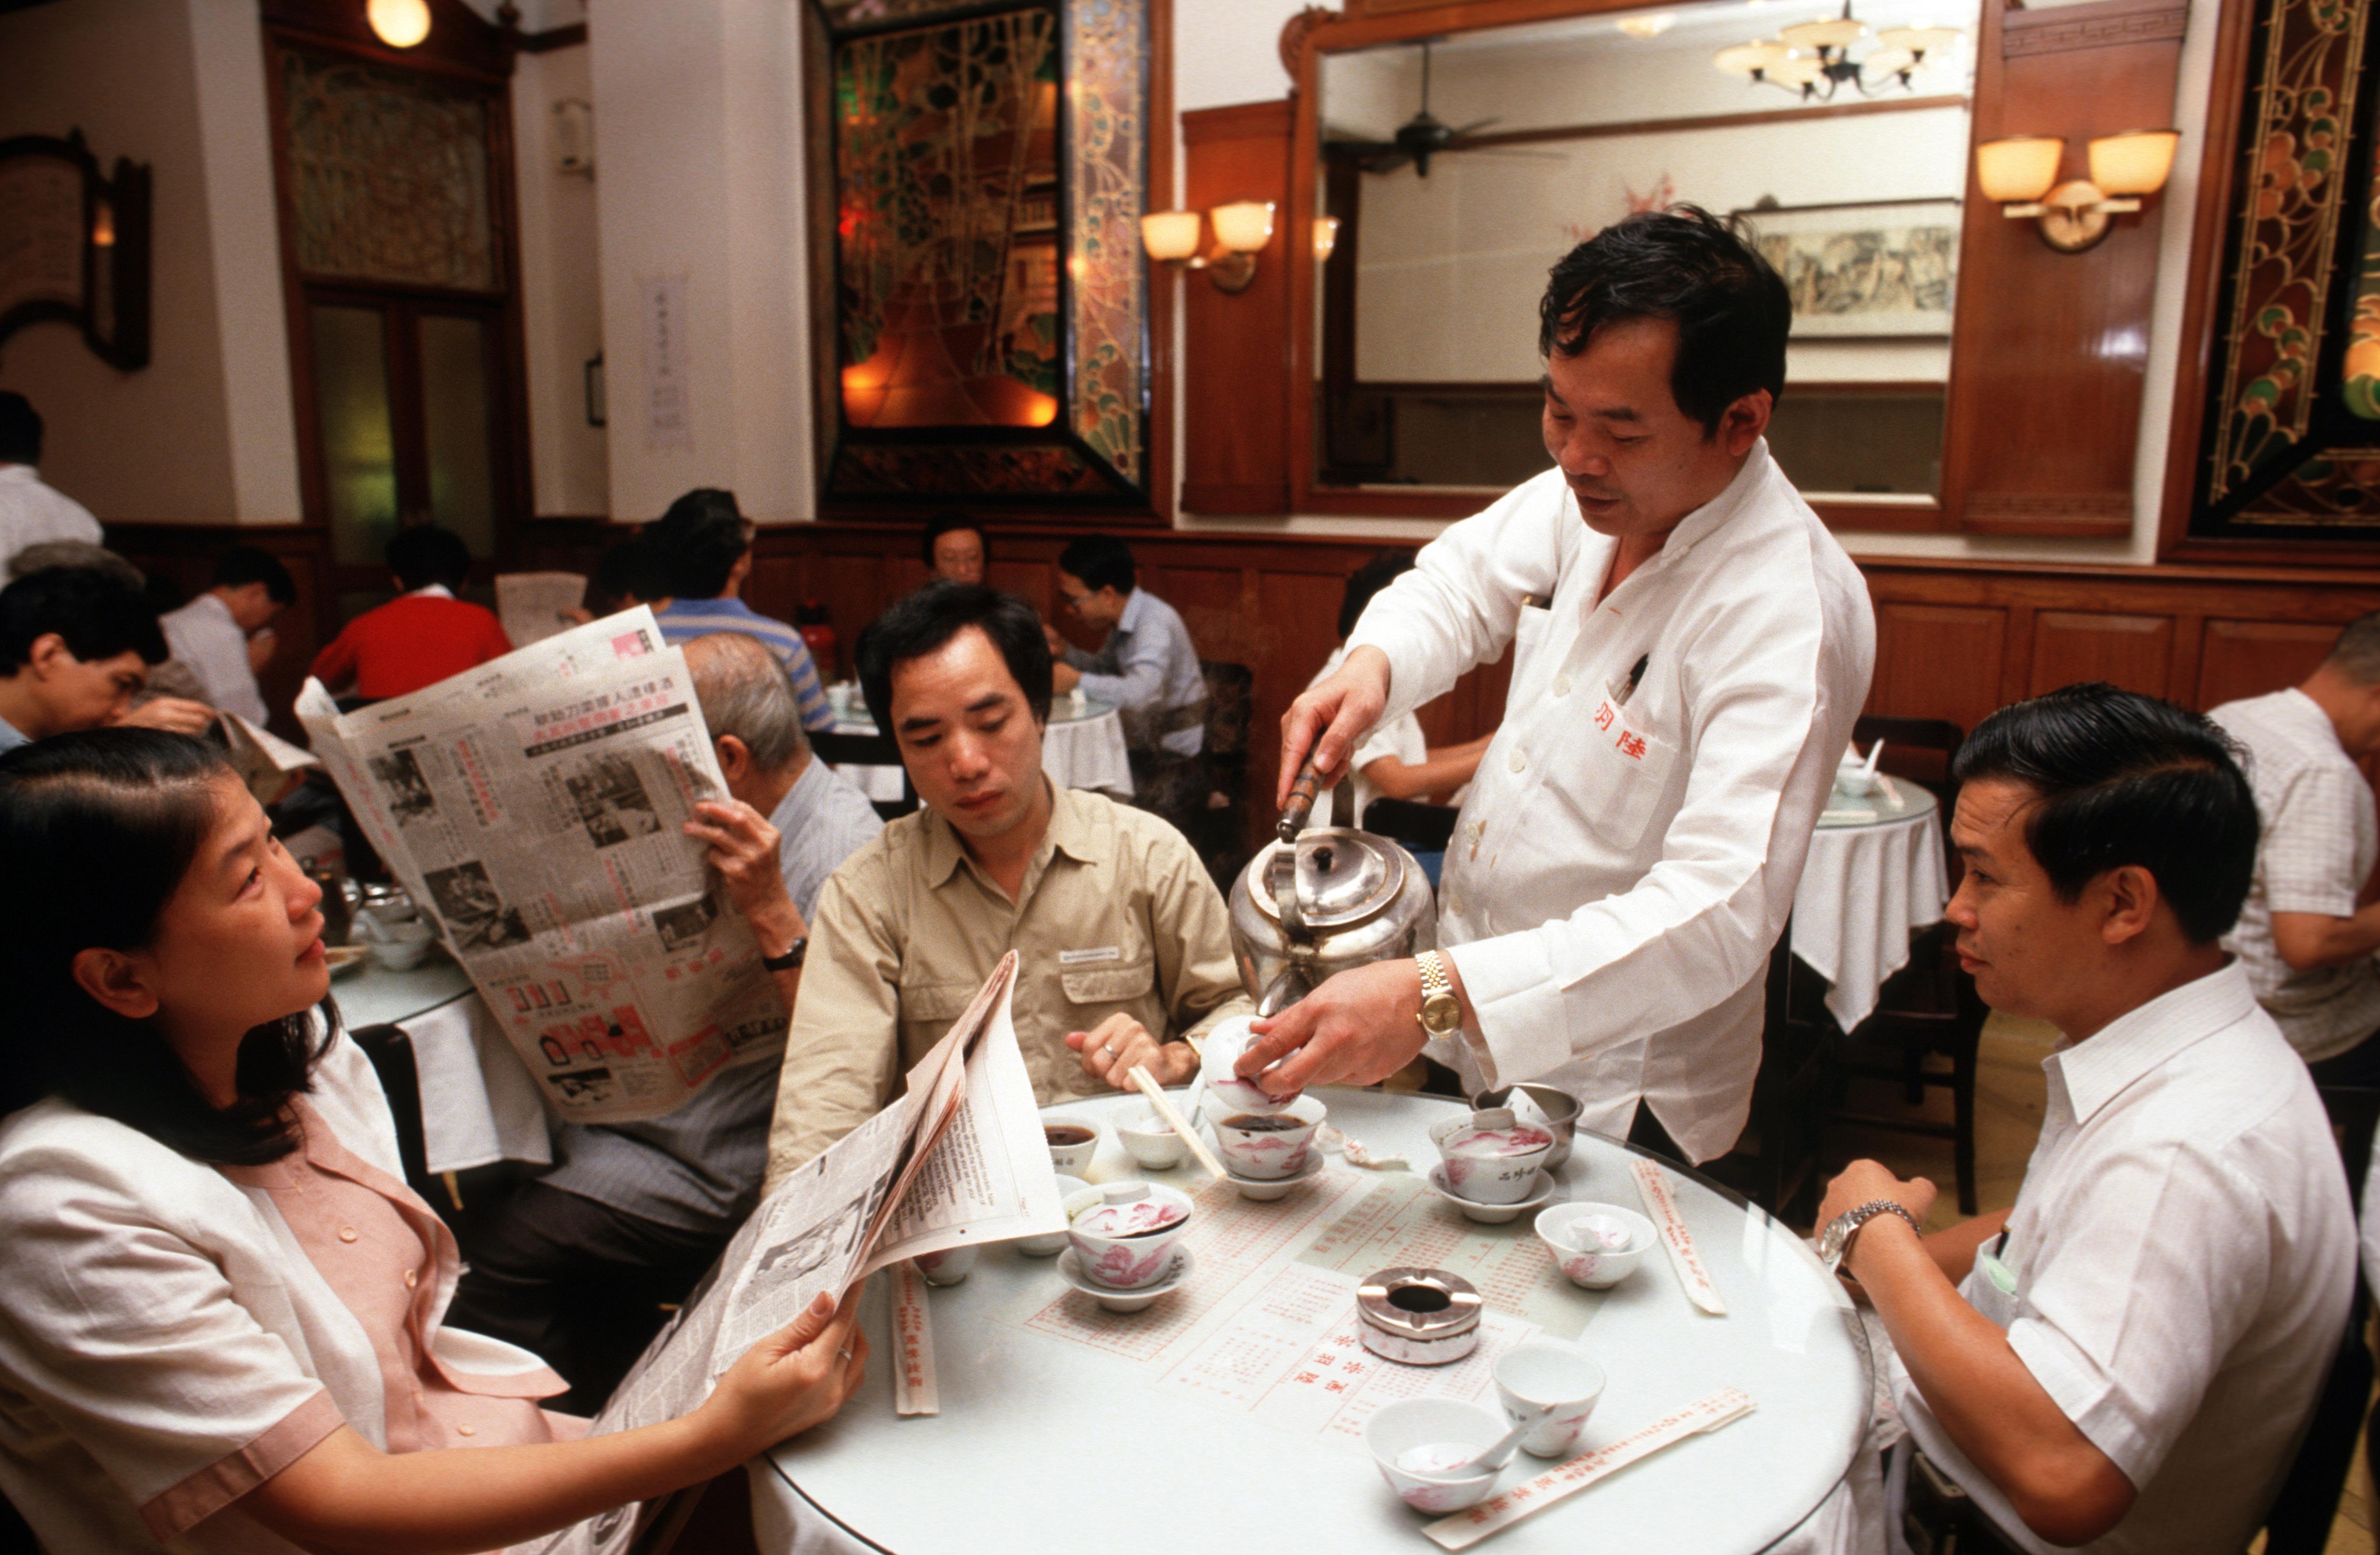 A waiter serves tea at Lukyu Tea House, Hong Kong. Photo by Peter Charlesworth/LightRocket via Getty Images.